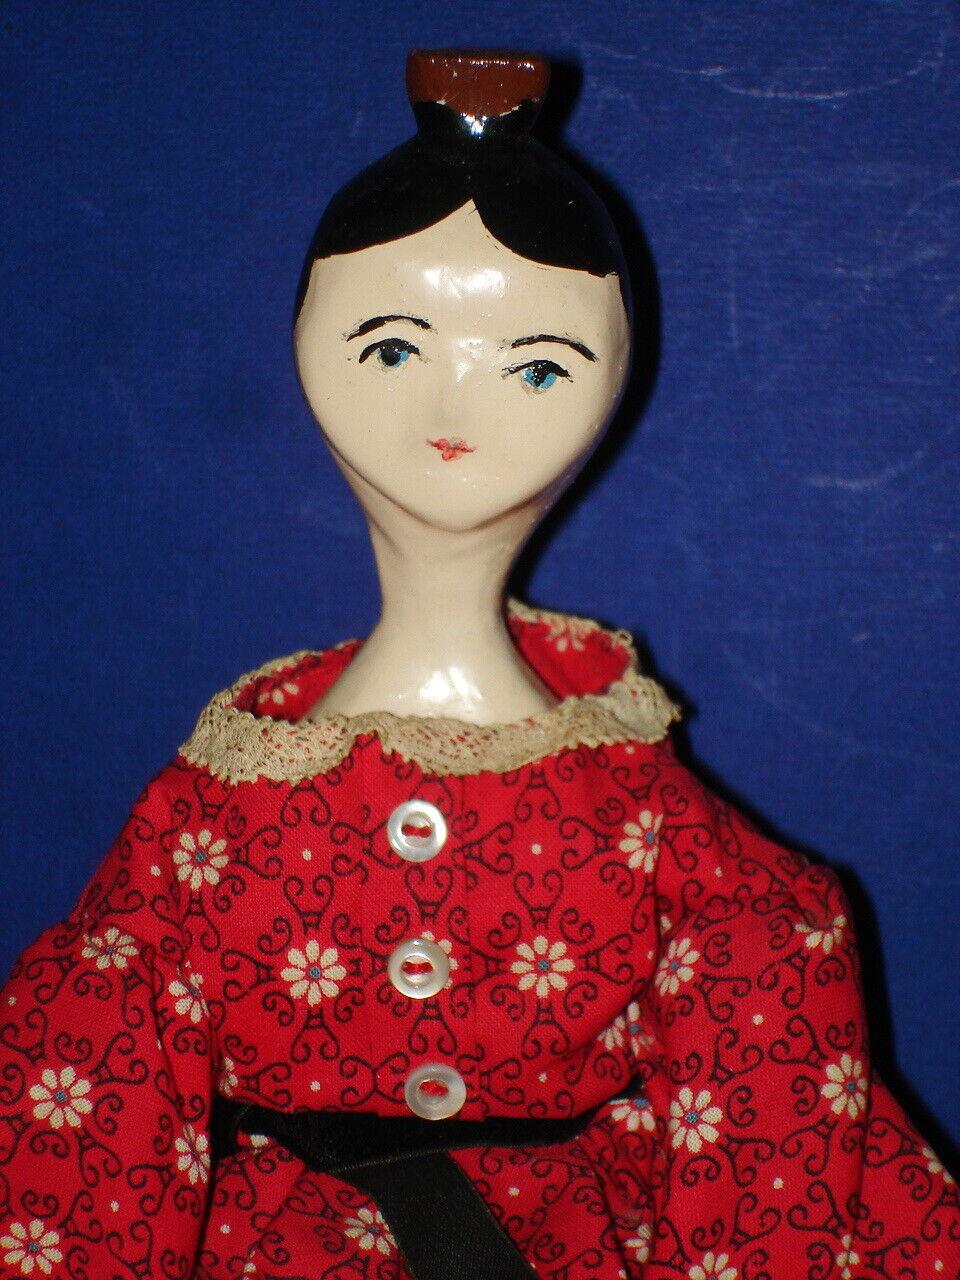 Artist 14.5  Peg Wooden Doll Possbily A McCalls Pattern Inspirot Doll 1950s-on